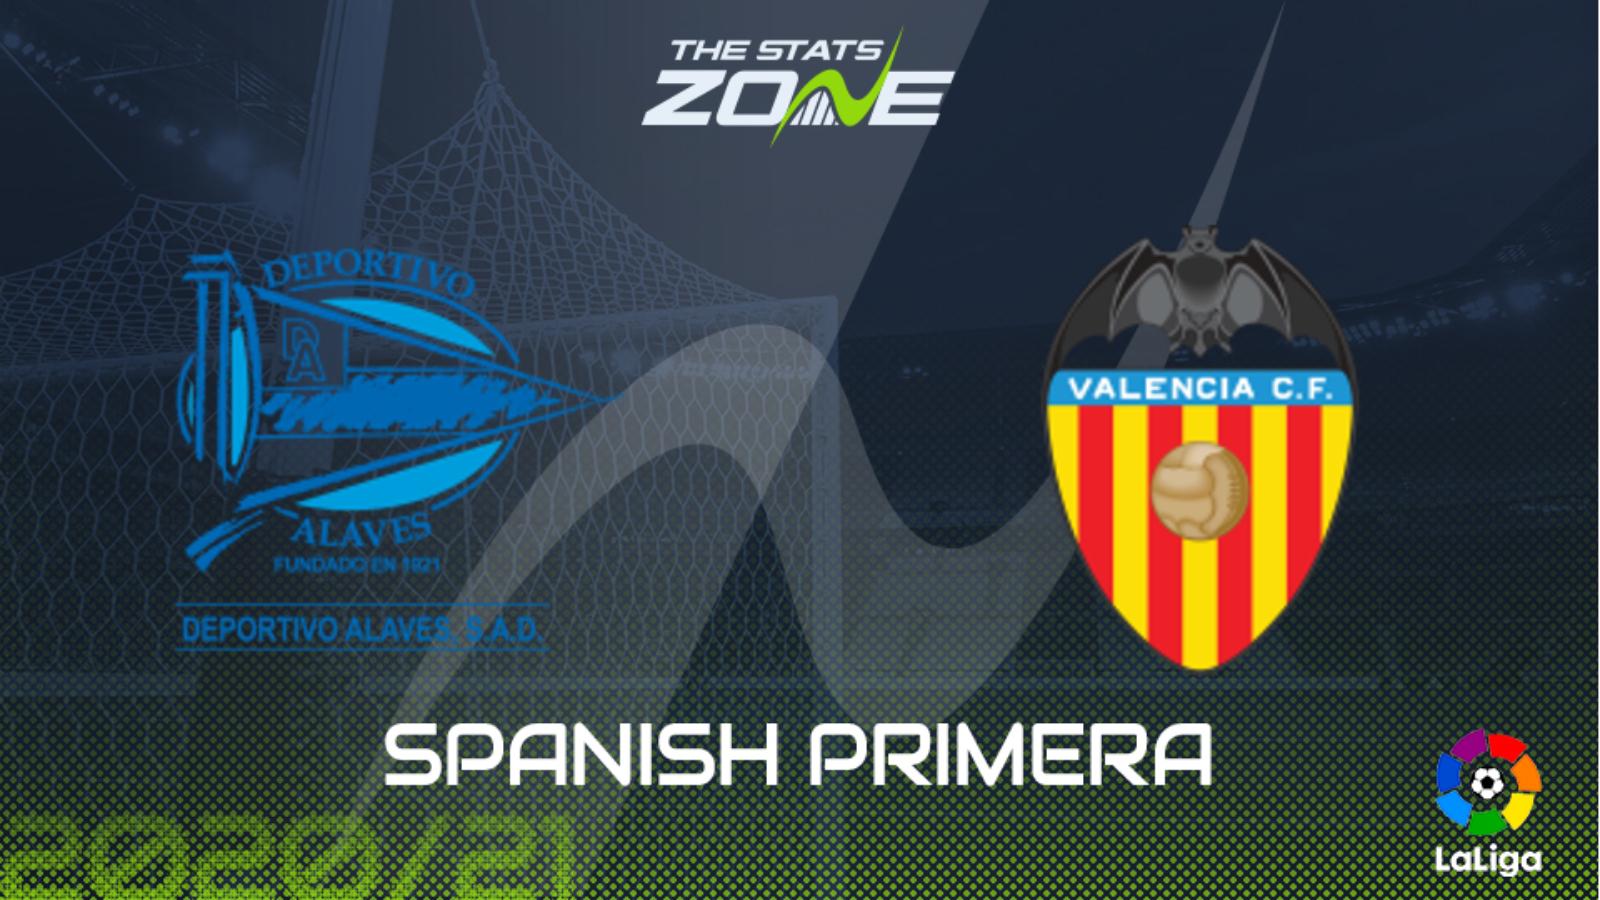 Deportivo vs valencia betting tips auburn vs georgia betting line